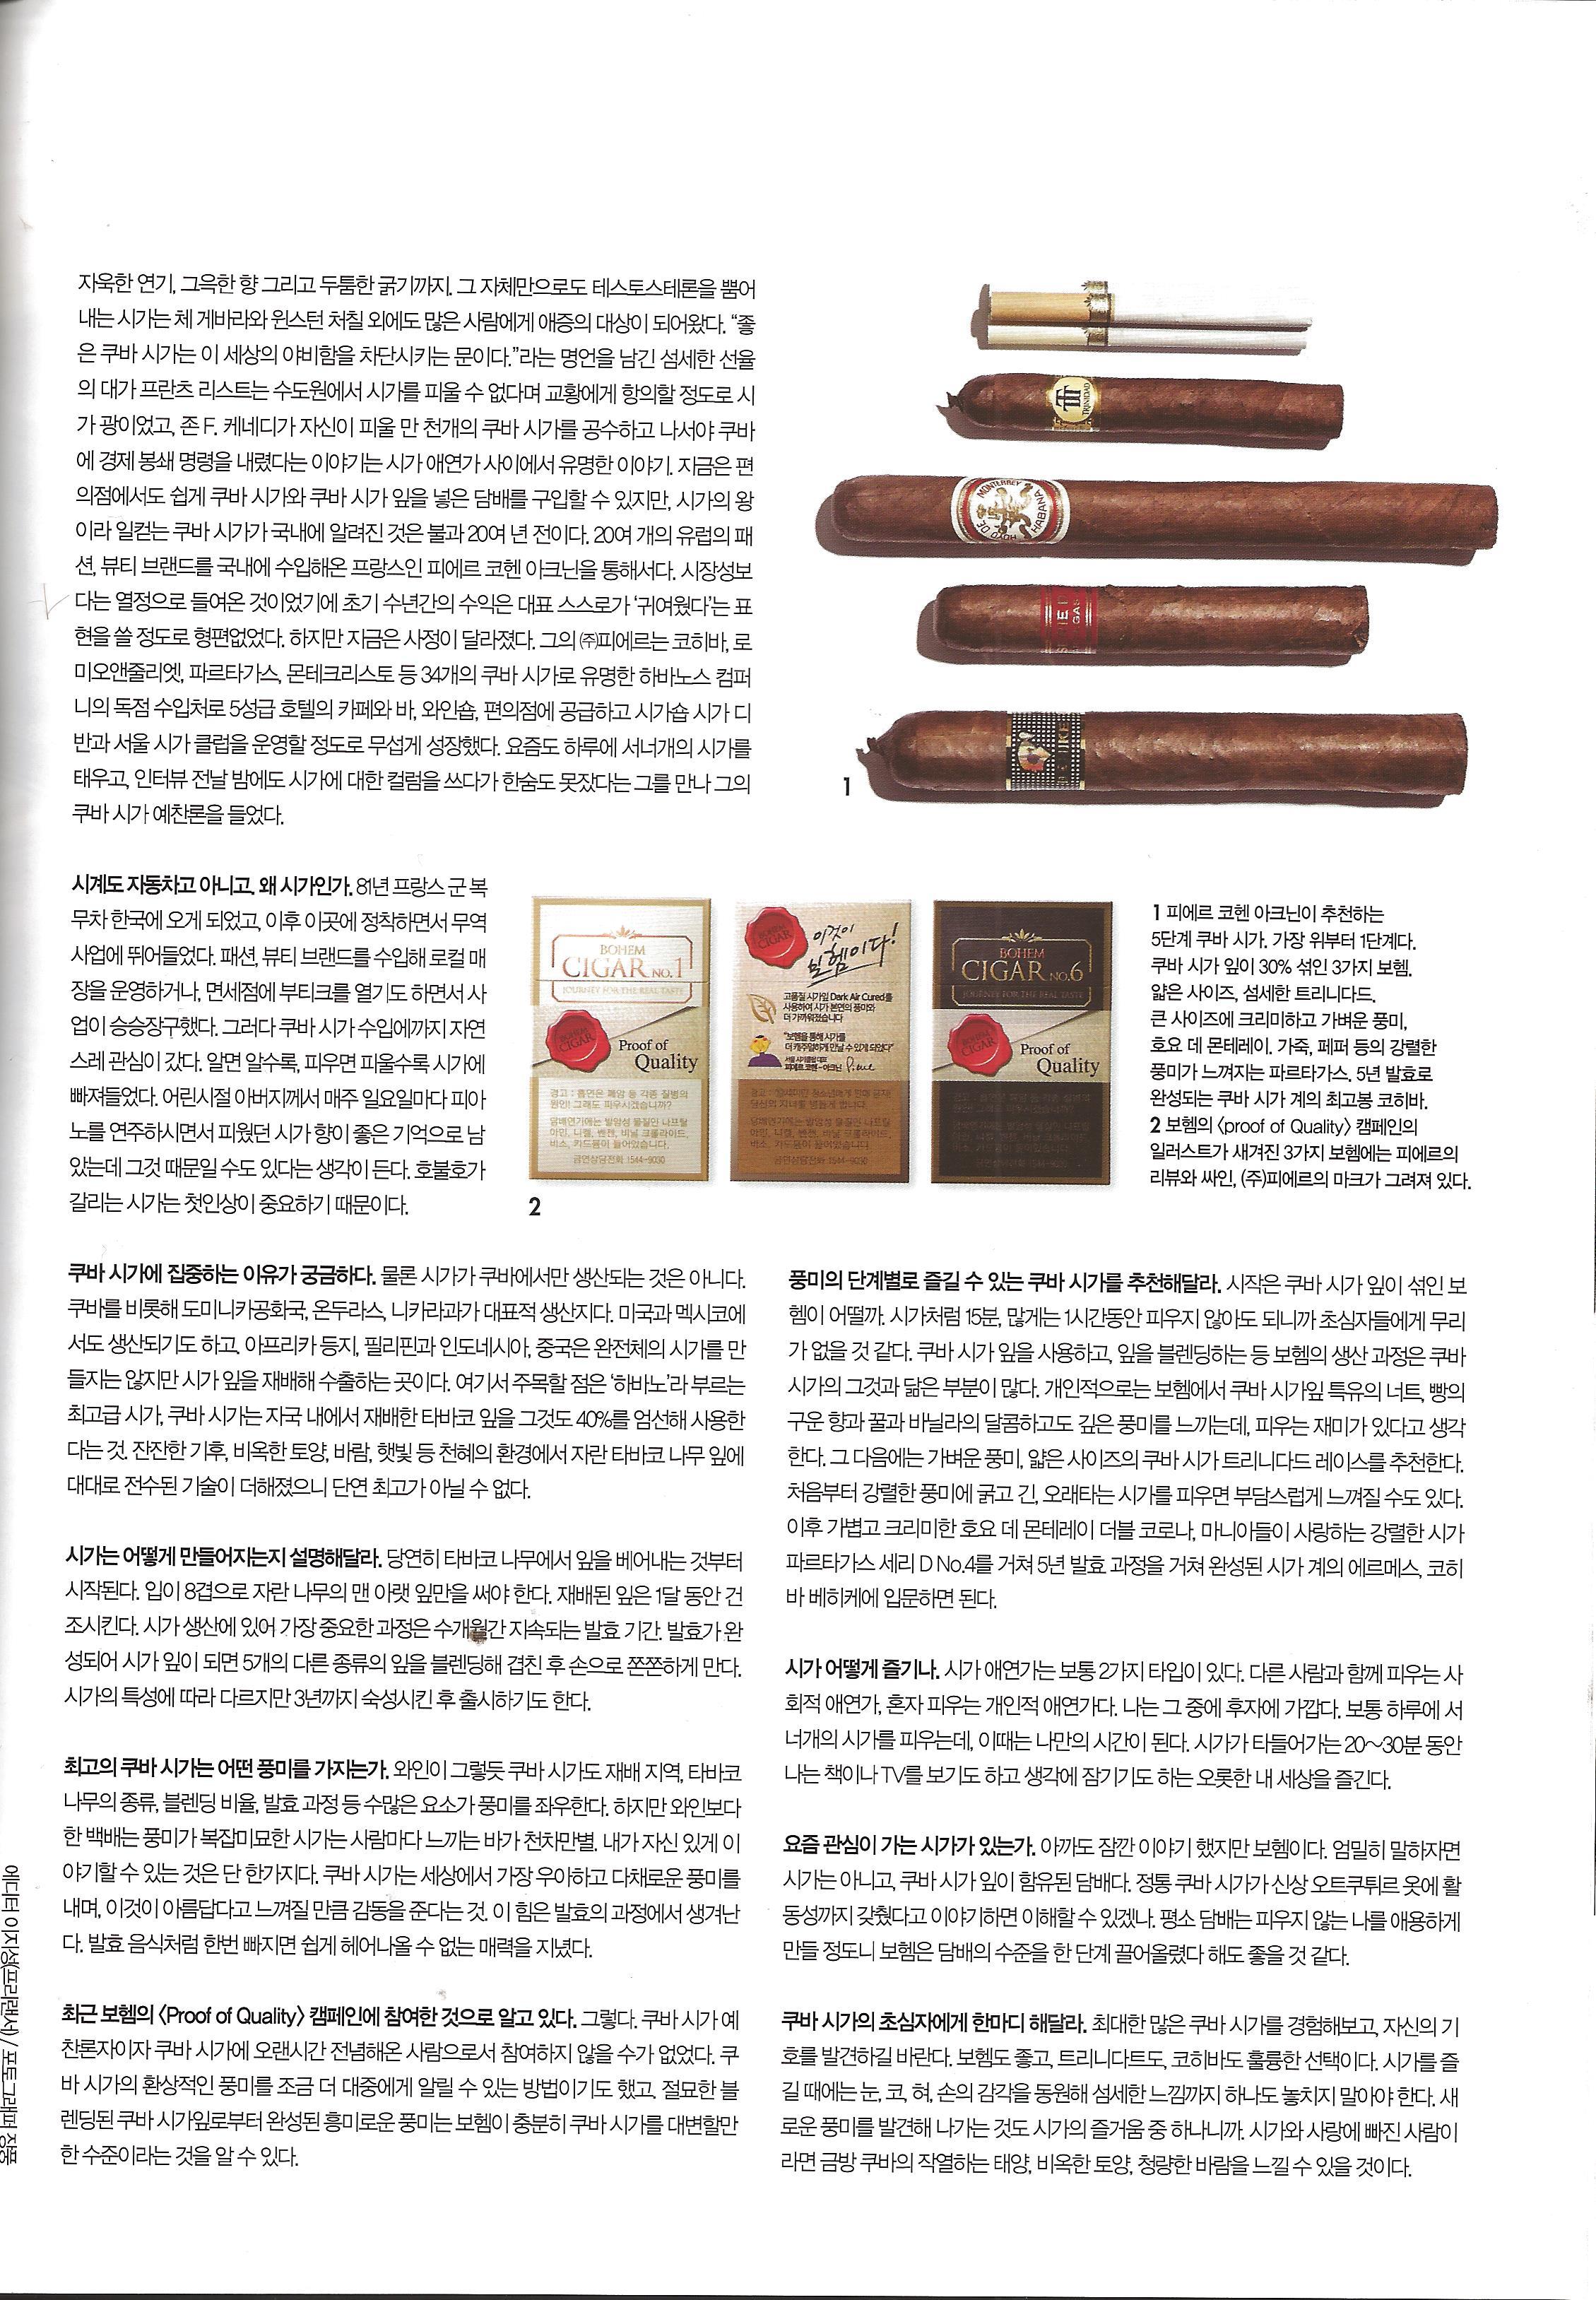 2014-4 GQ article 2.jpg